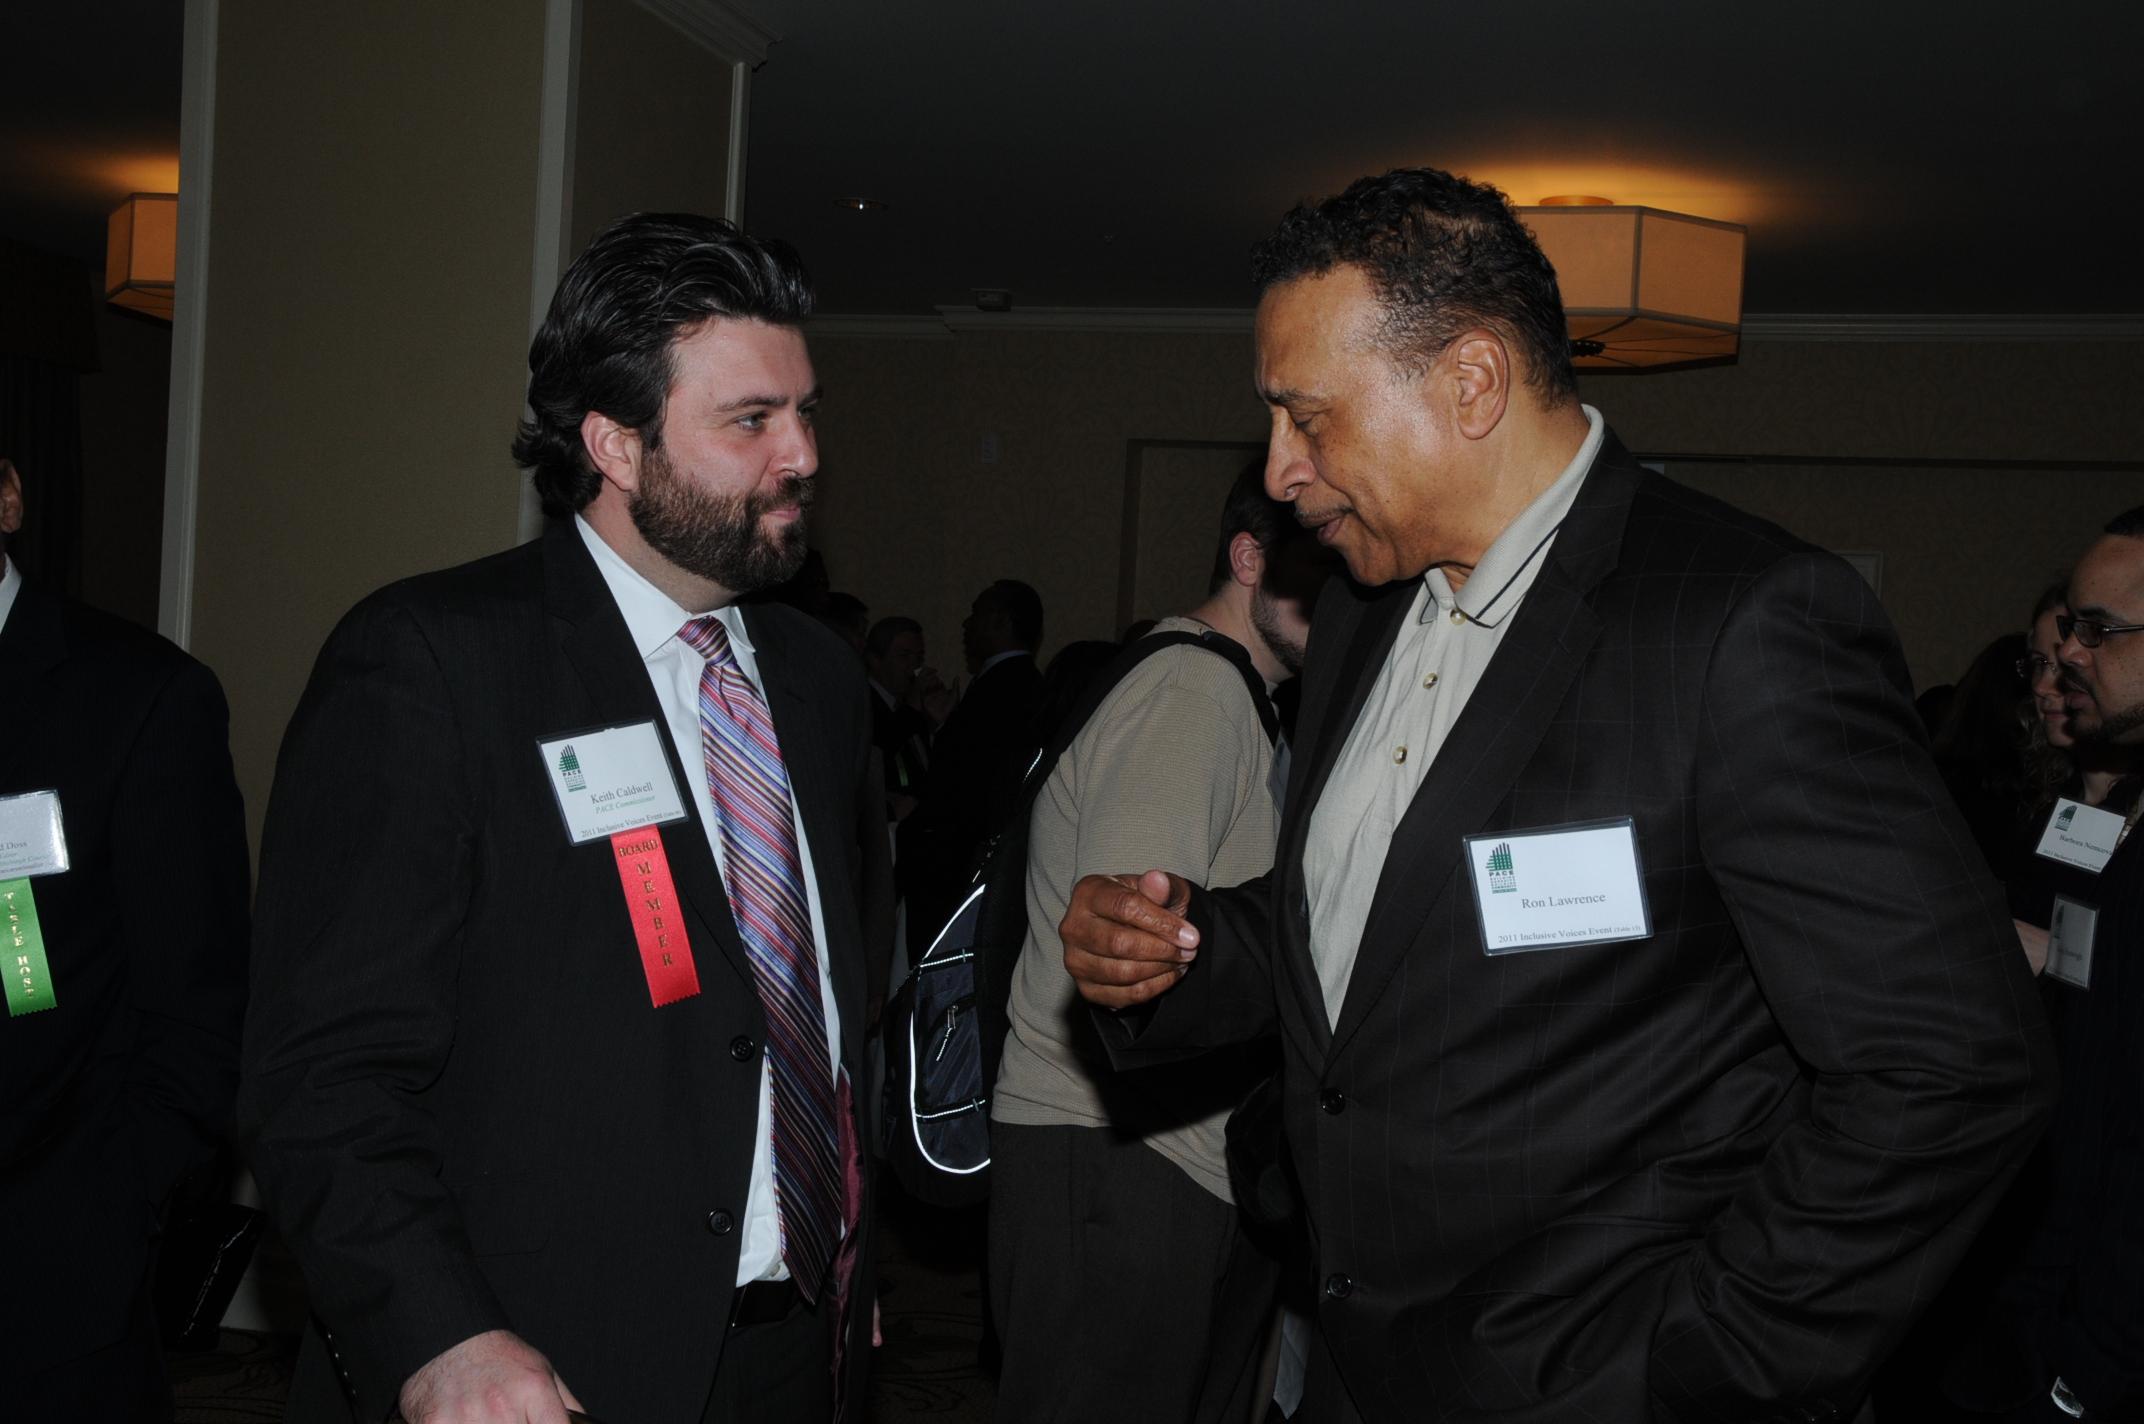 Keith Caldwell & Ron Lawrence 2.JPG